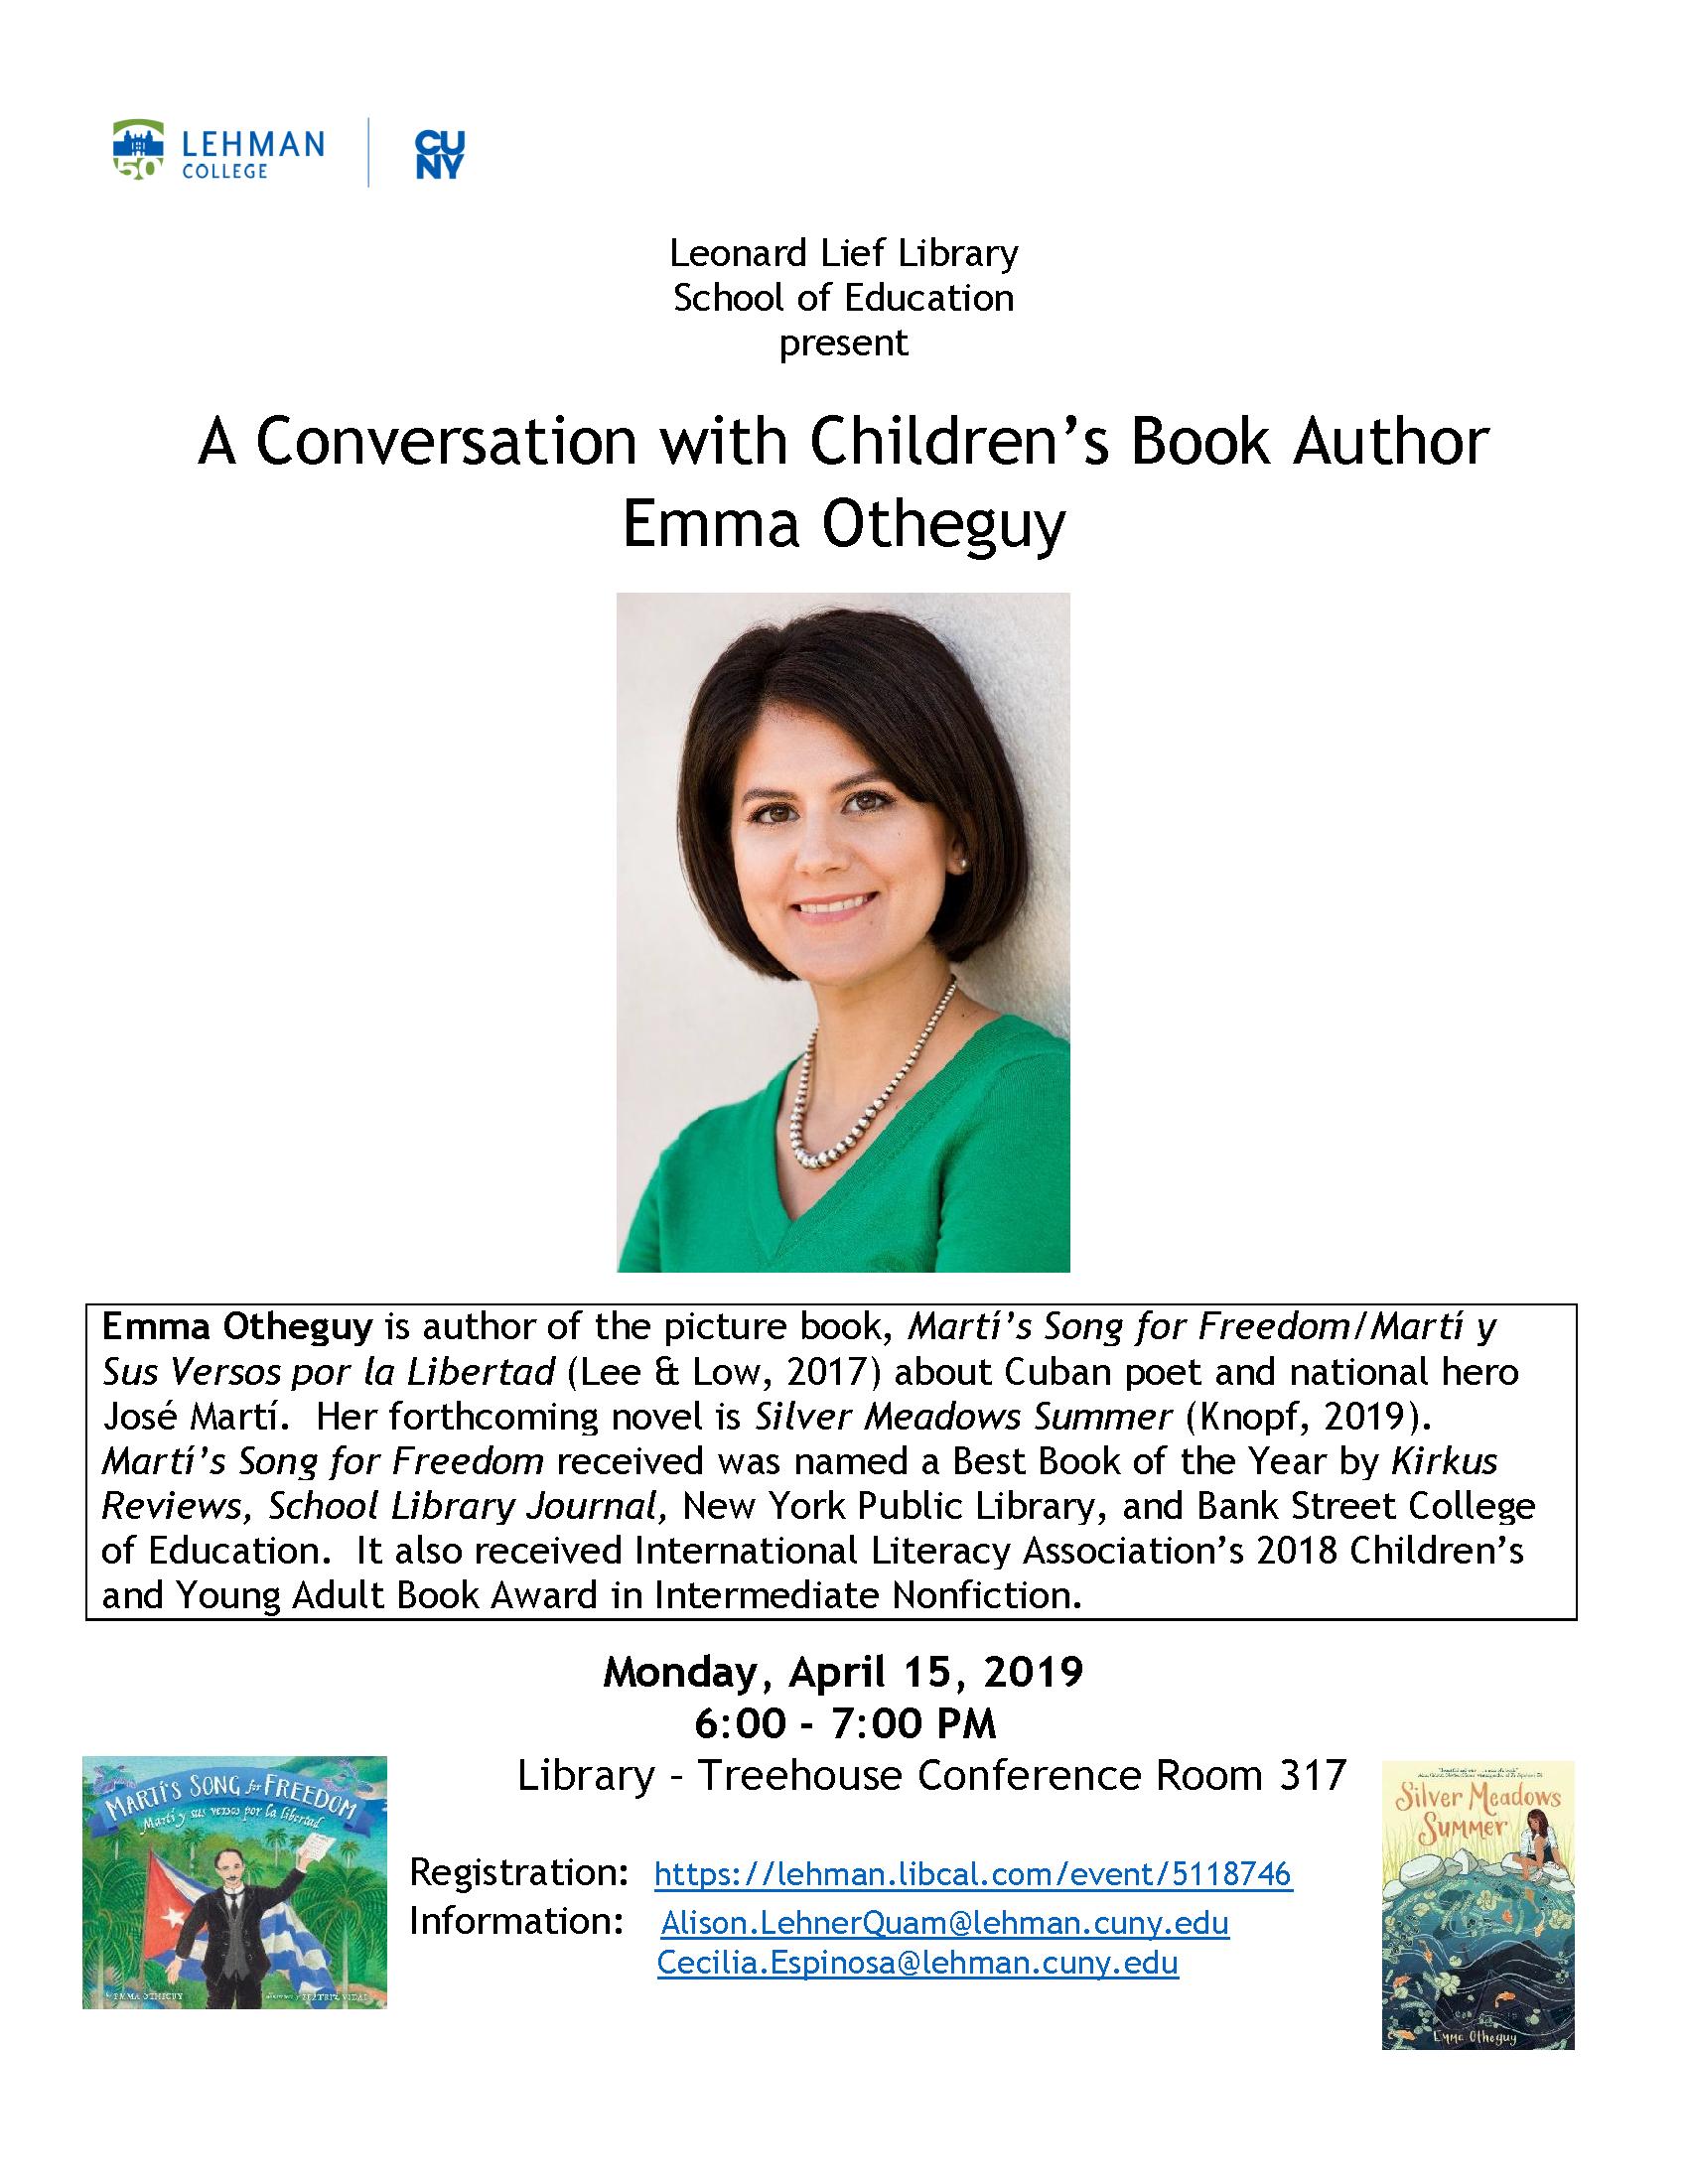 Emma Otheguy: Children's Book Author